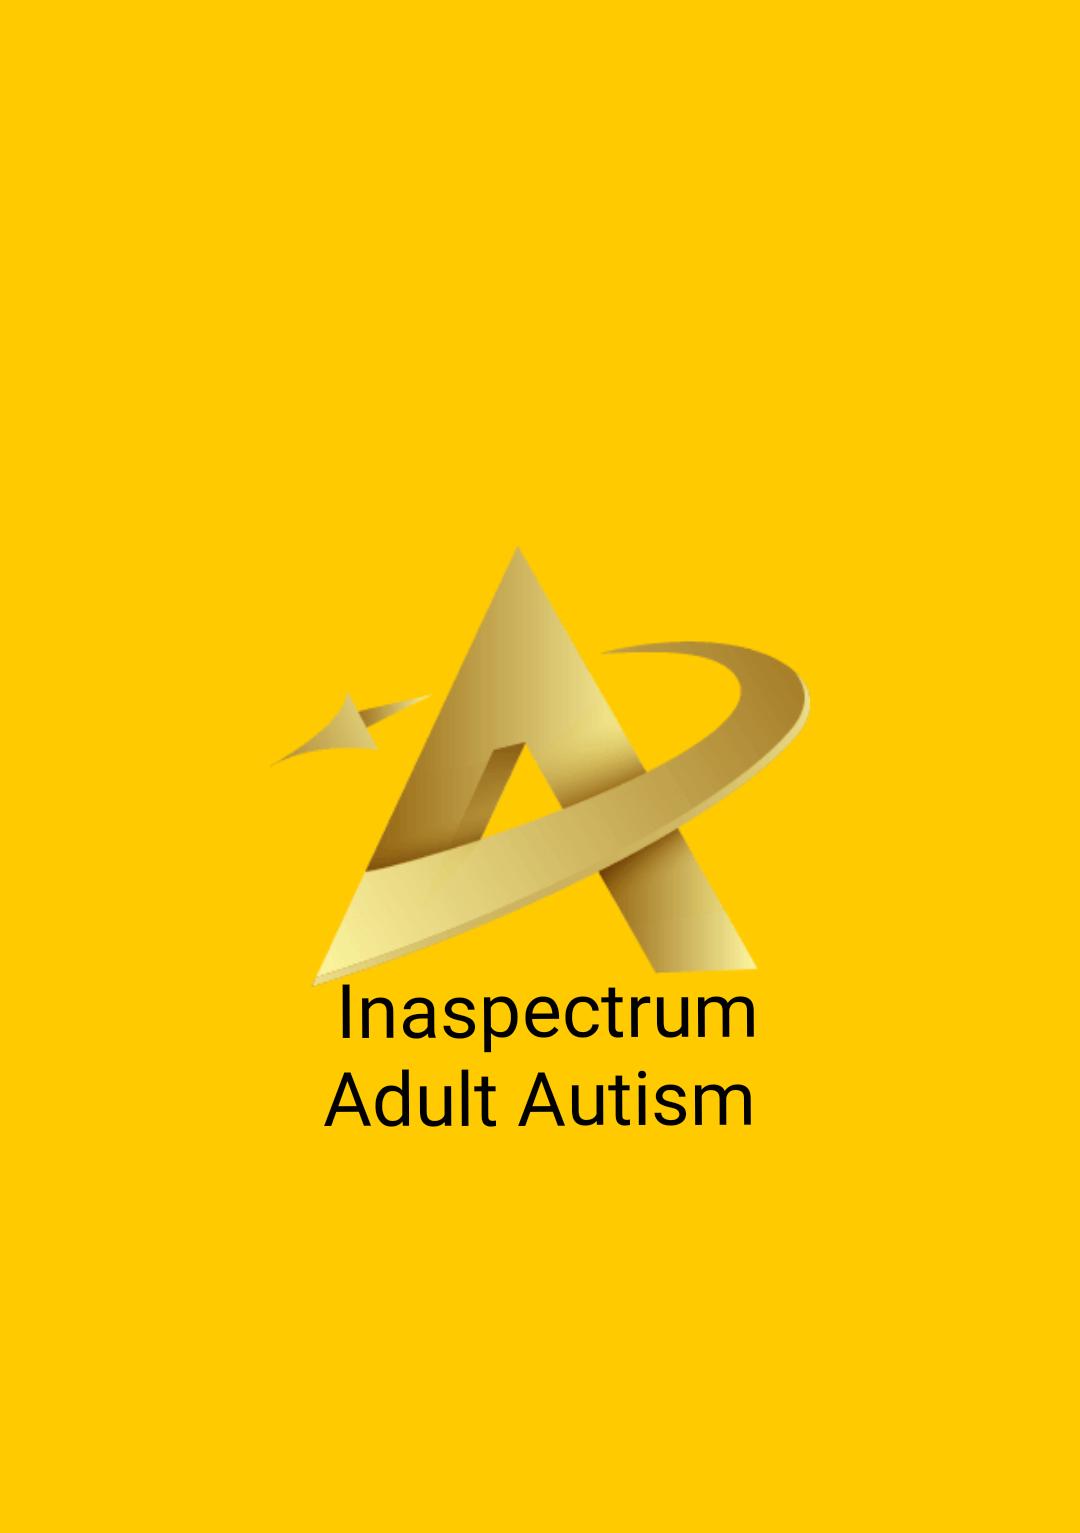 Inaspectrum Adult Autism - https://www.inaspectrum.com/